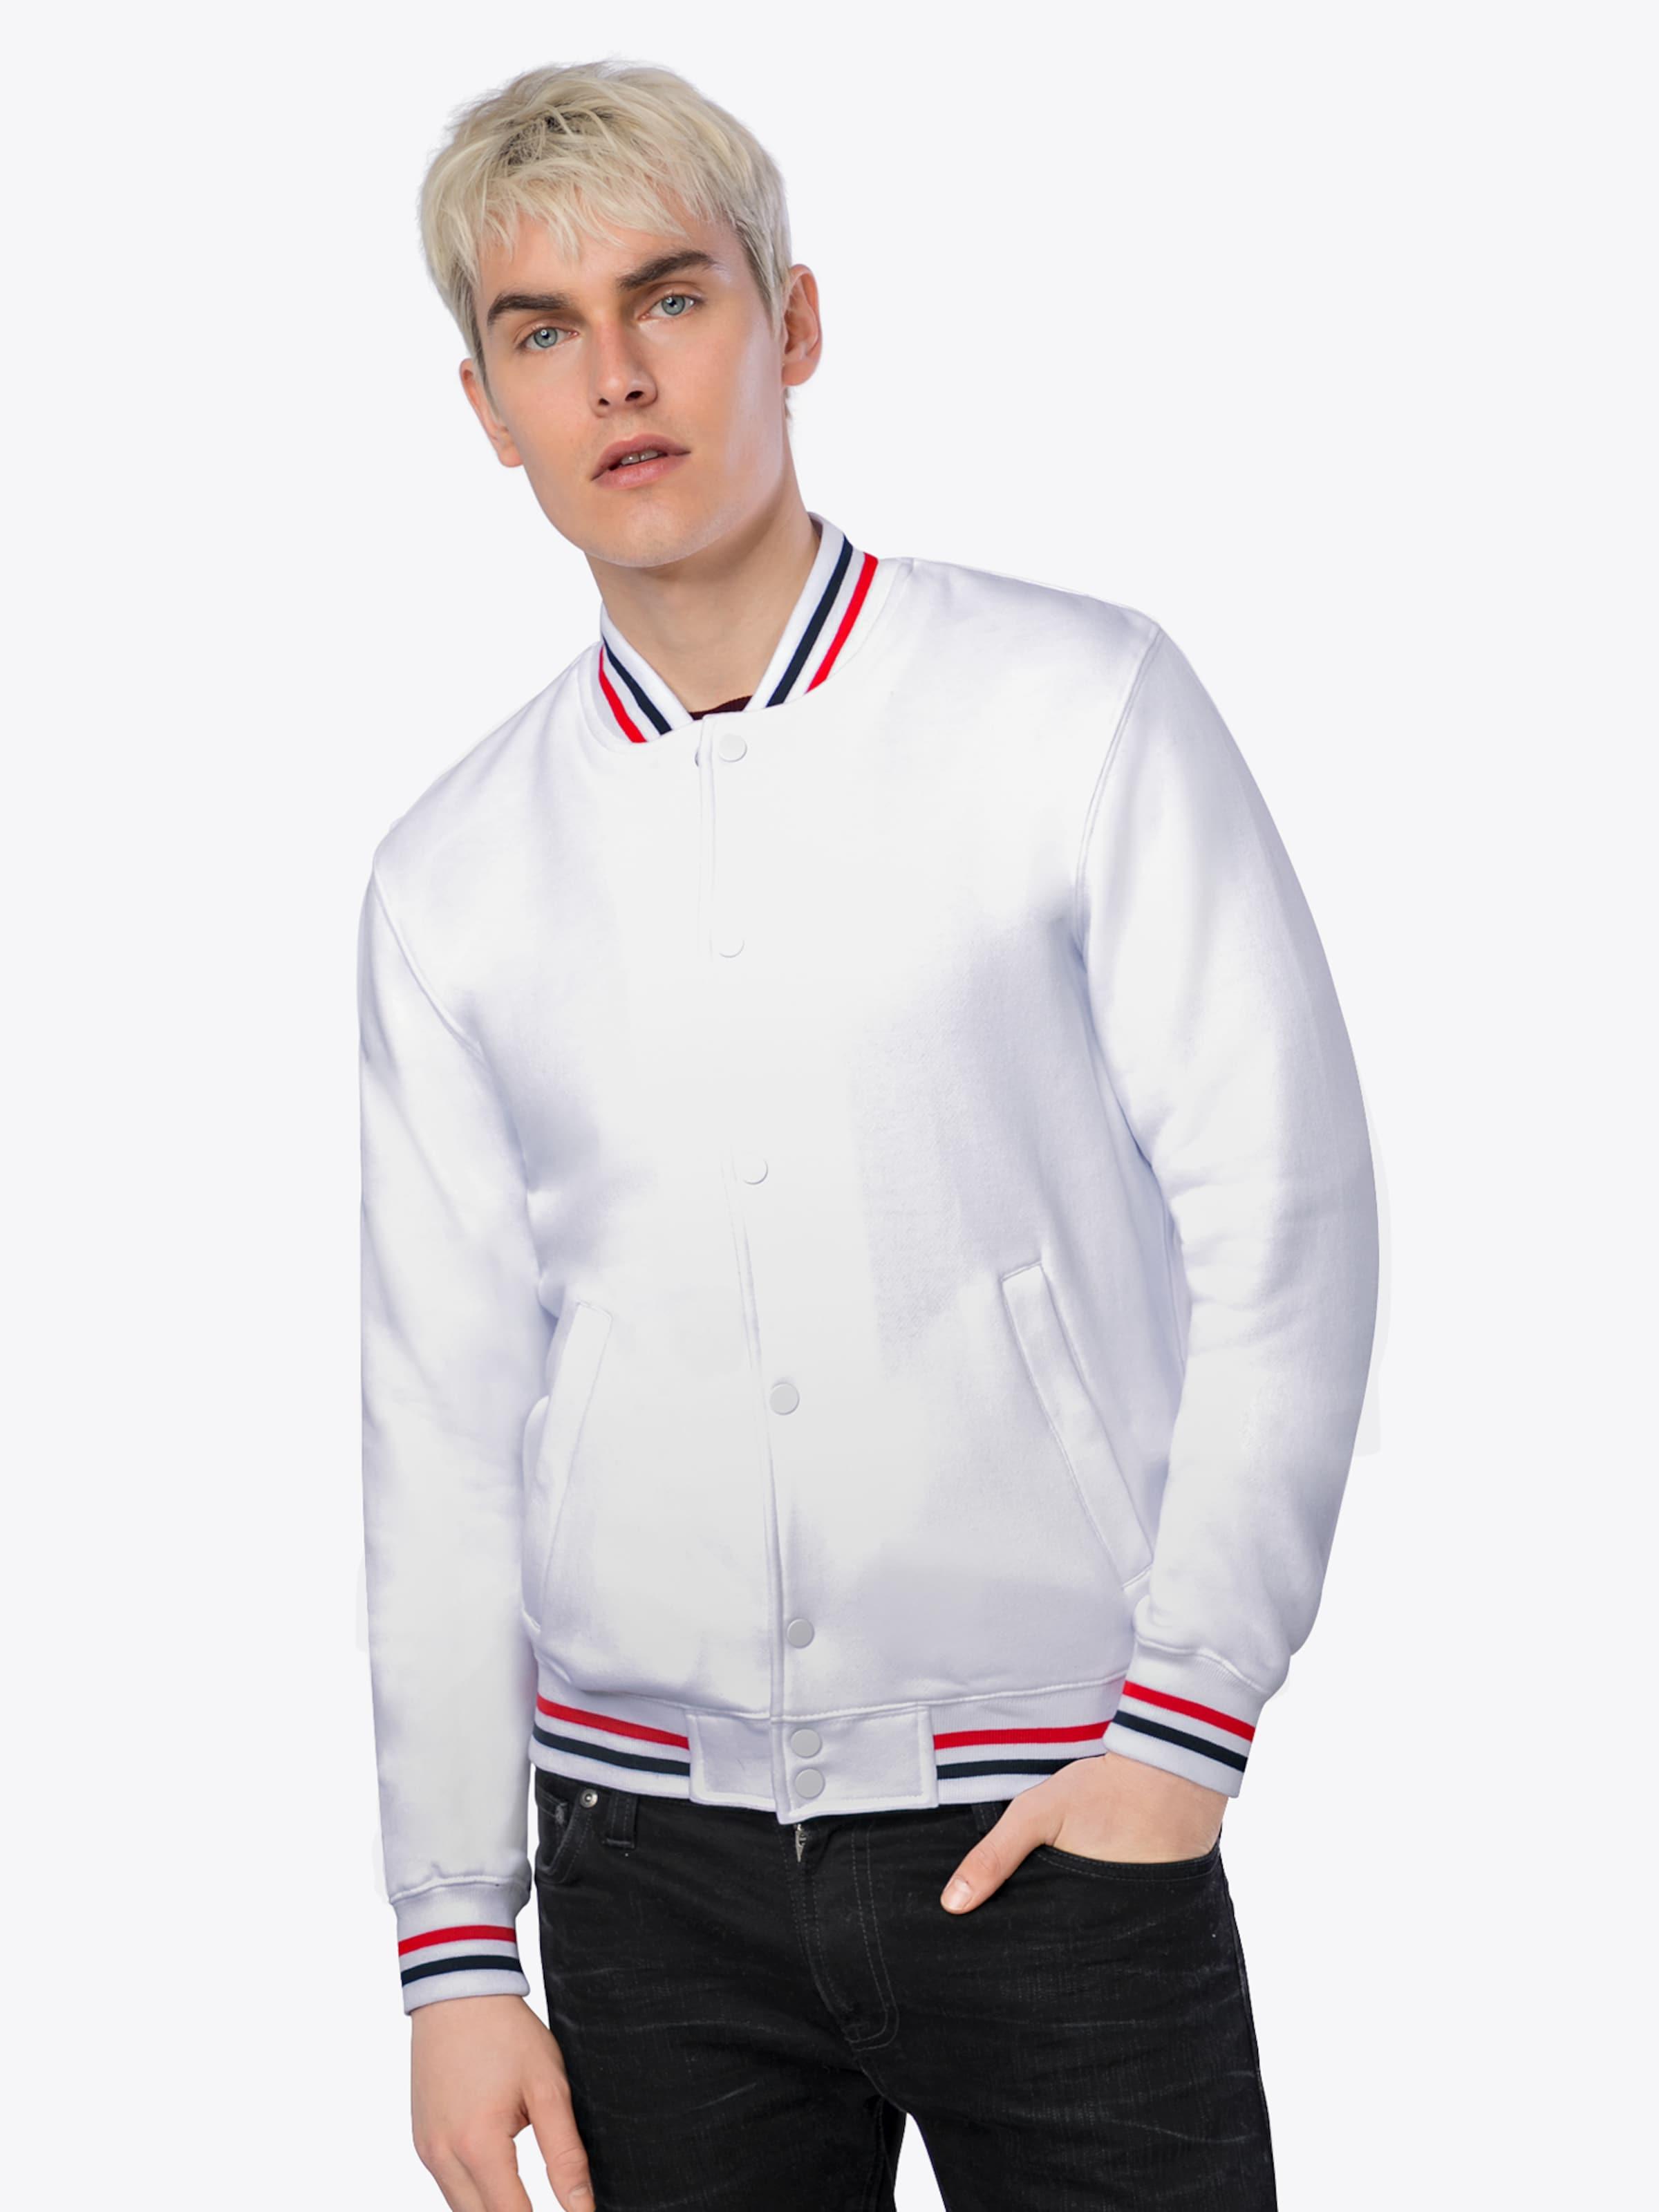 Sweat Classics Urban tone 3 College Weiß Jacket In NavyRot Yf7bv6gy